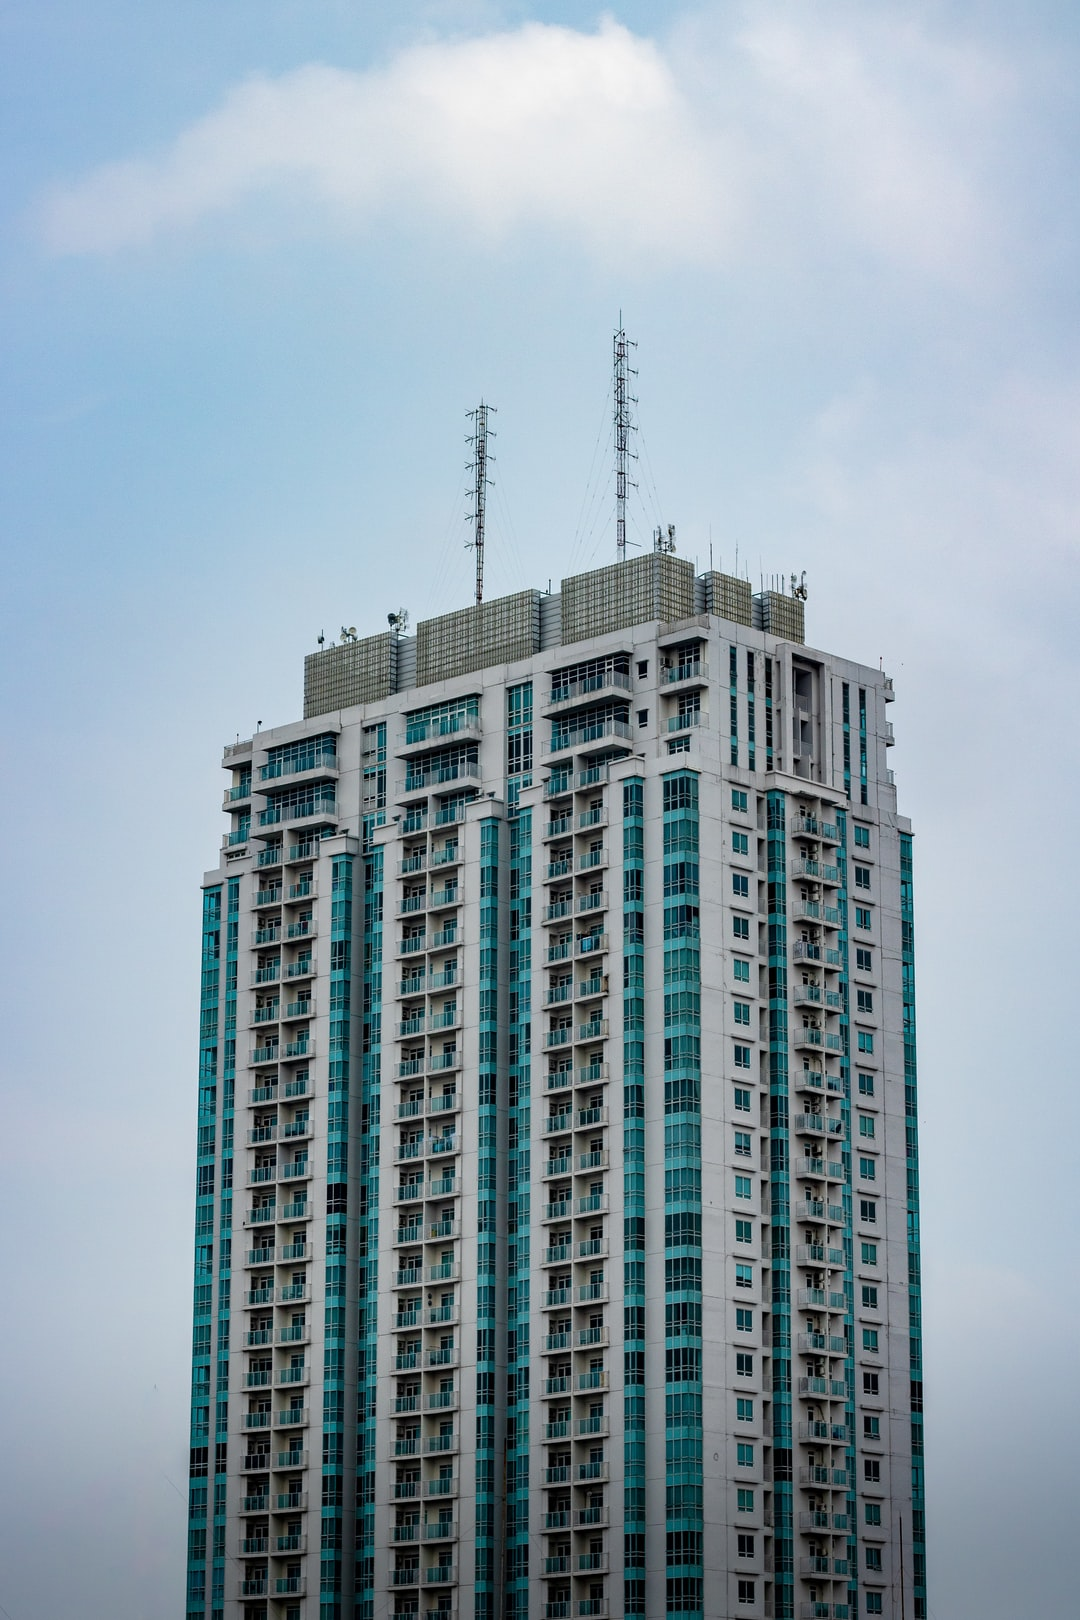 Trillium Apartment and office building in Jl Pemuda Surabaya